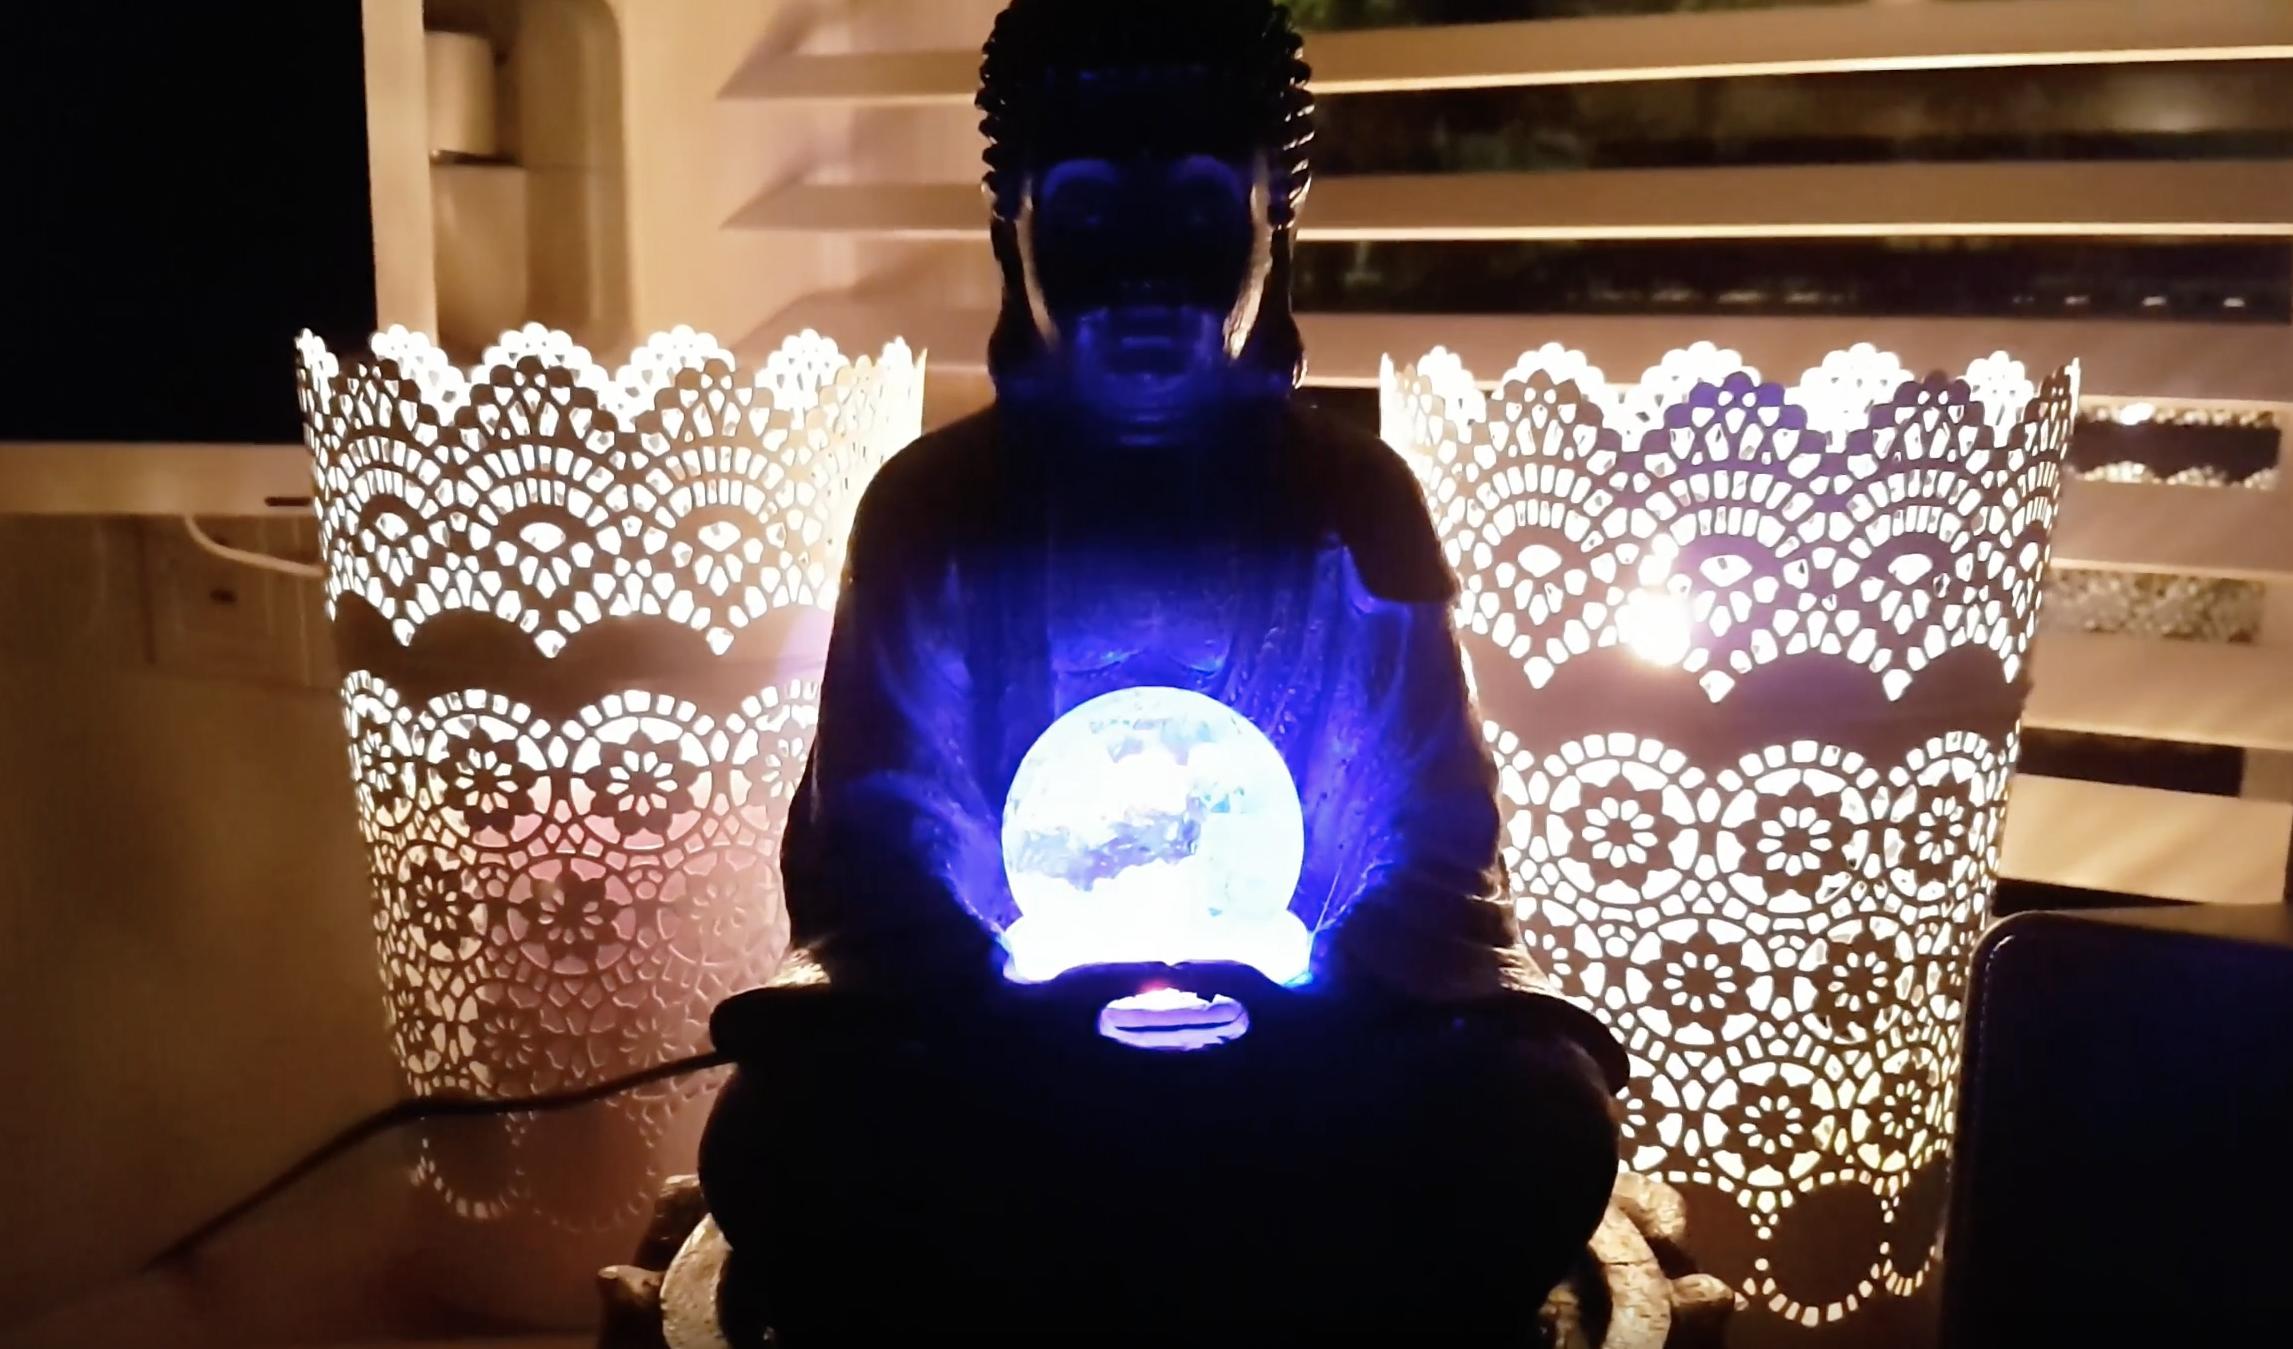 Boeddha Met Led Verlichting.Buddha Met Led Verlichting Glazen Bal Ca 30cm Jouwveilingen